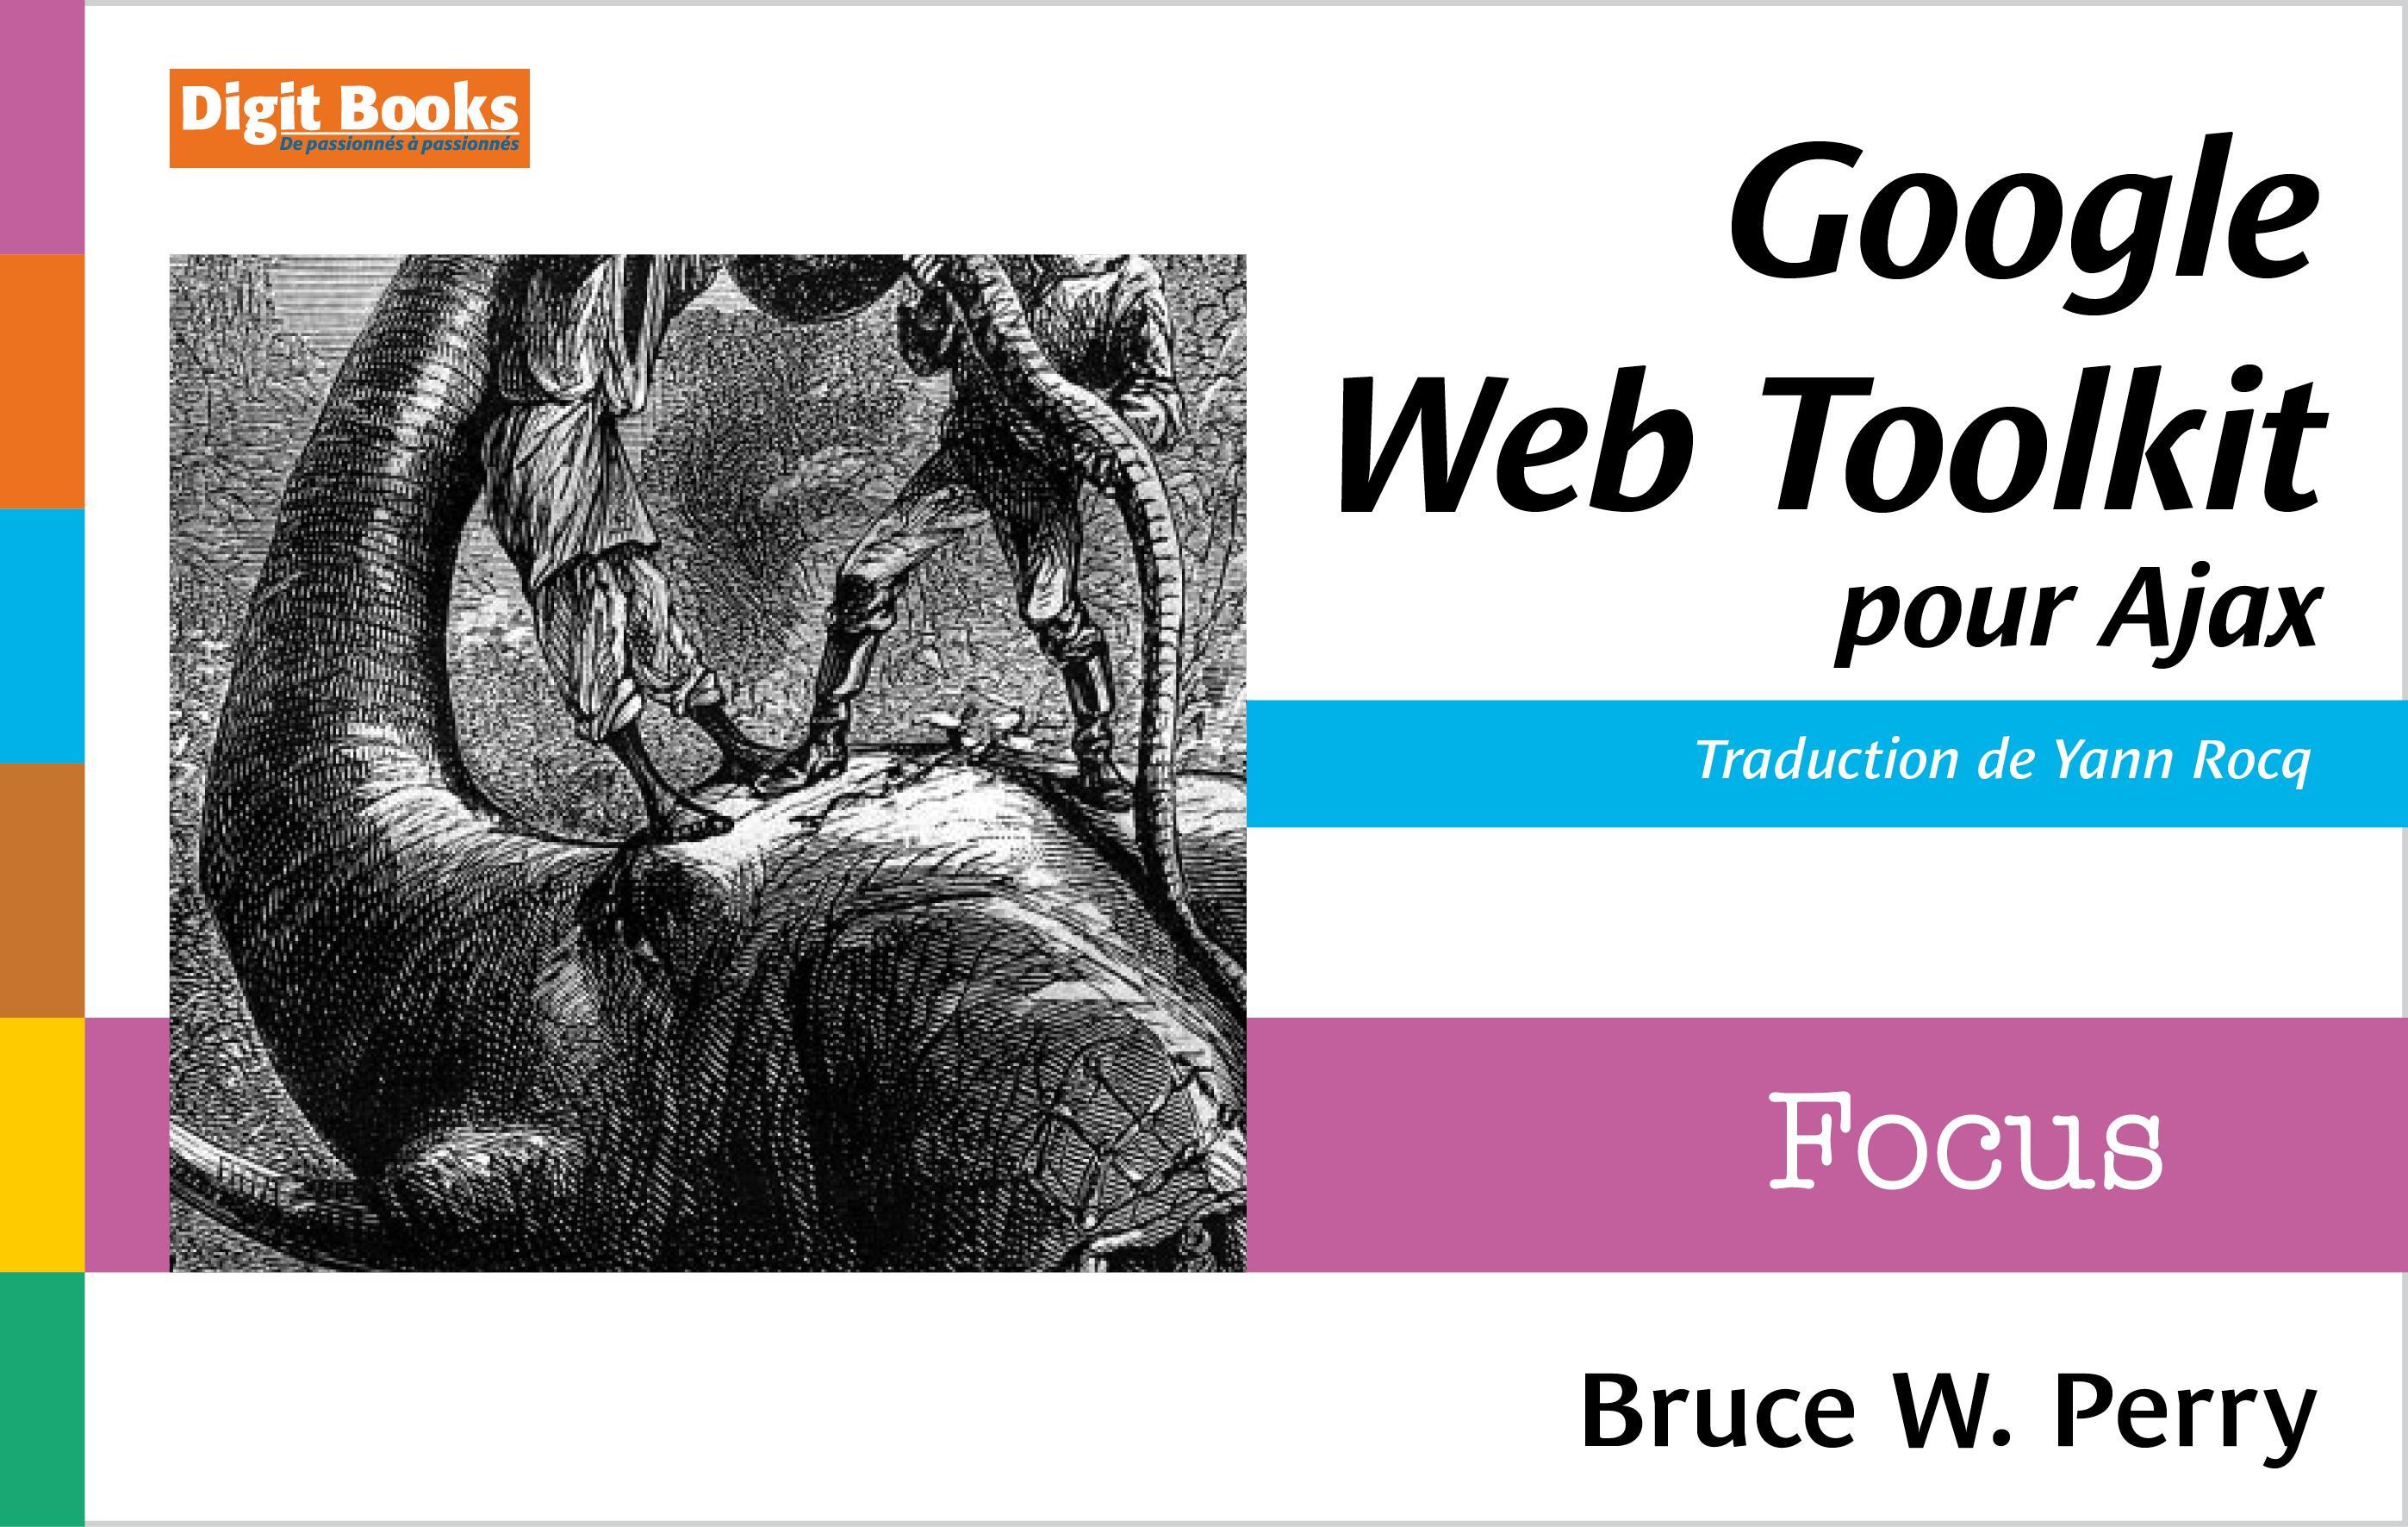 Google Web Toolkit pour Ajax